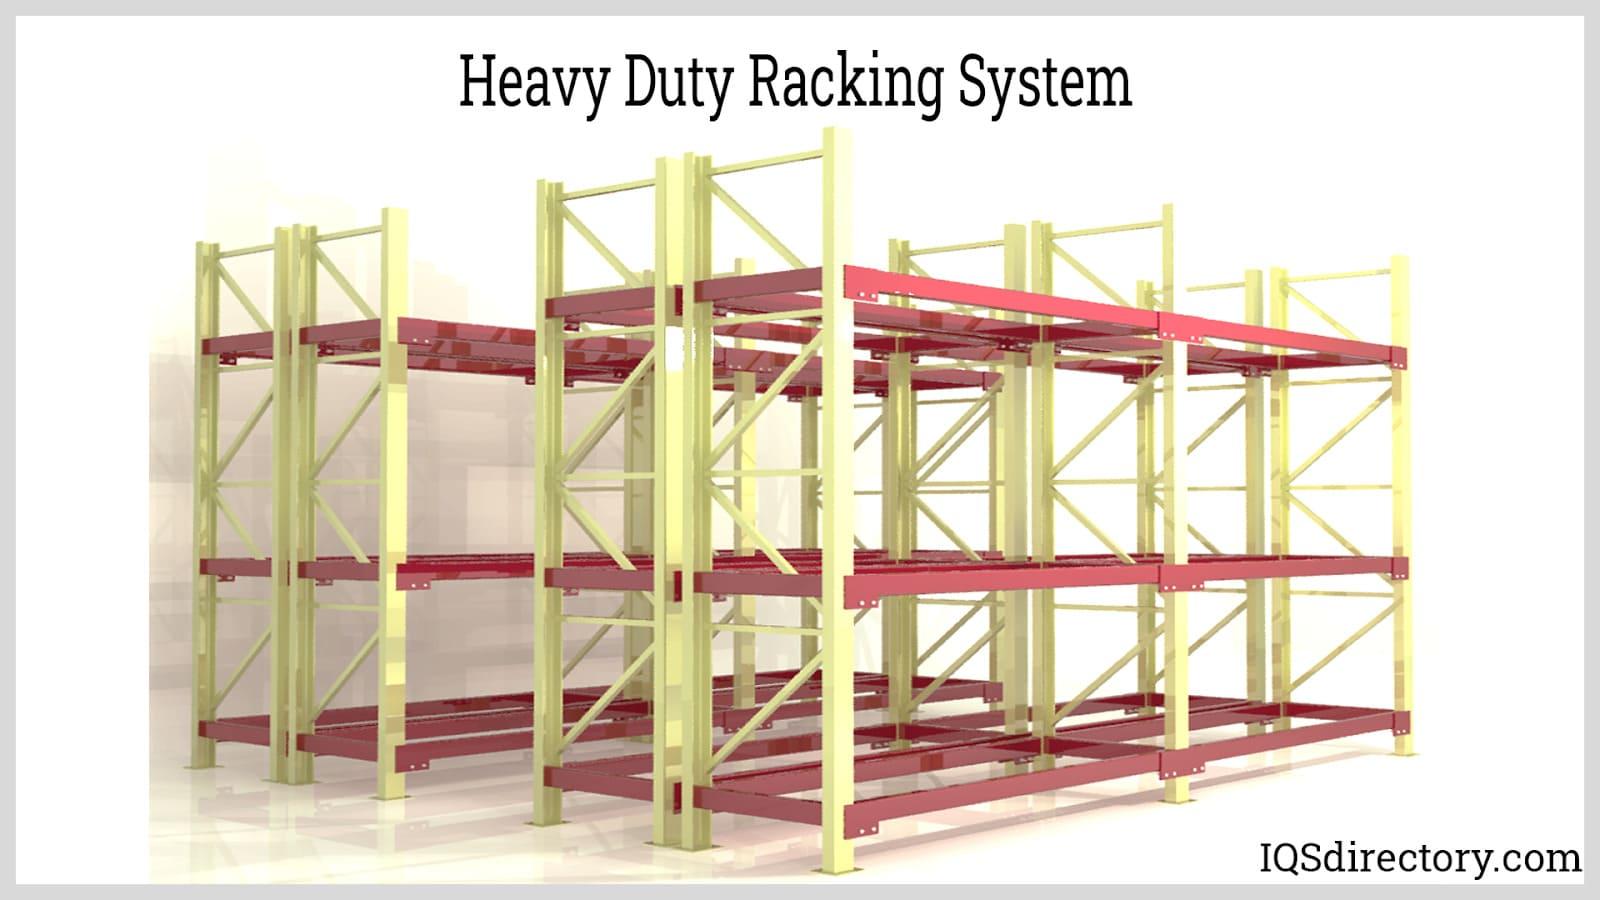 Heavy Duty Racking System